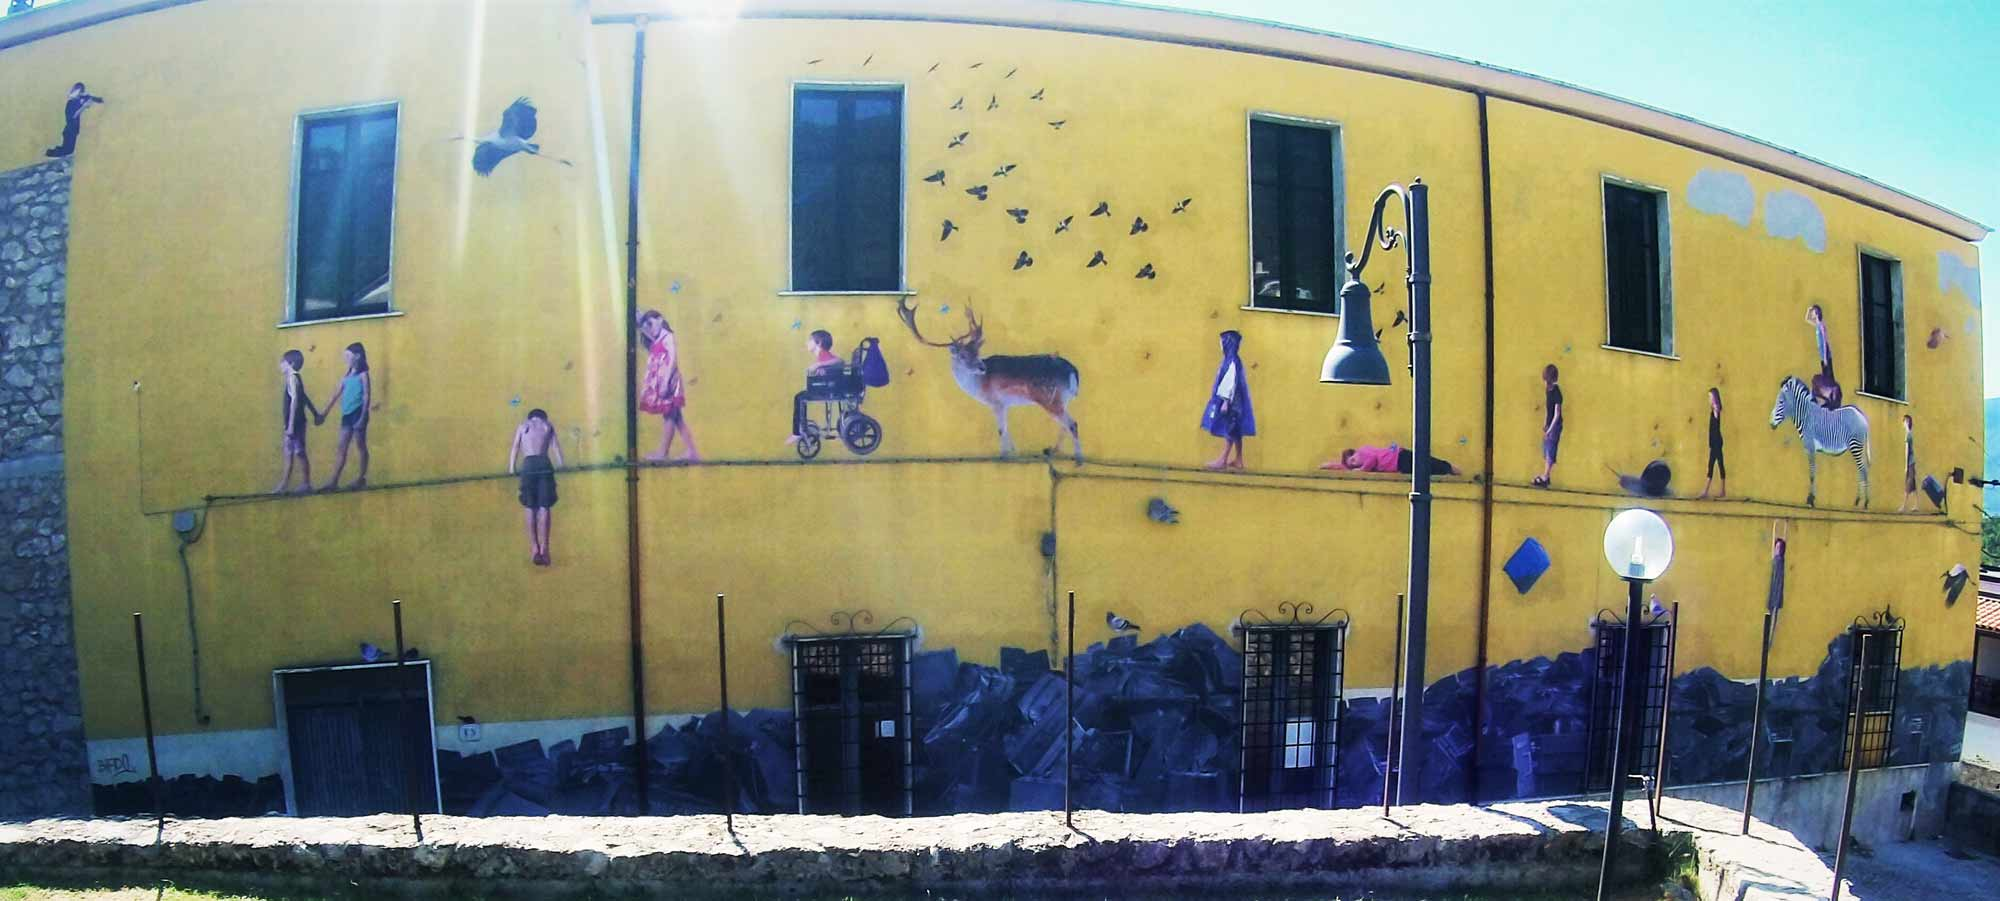 brooklyn-street-art-bifido-San-Potito-Sannitico-Italy-09-15-web-3